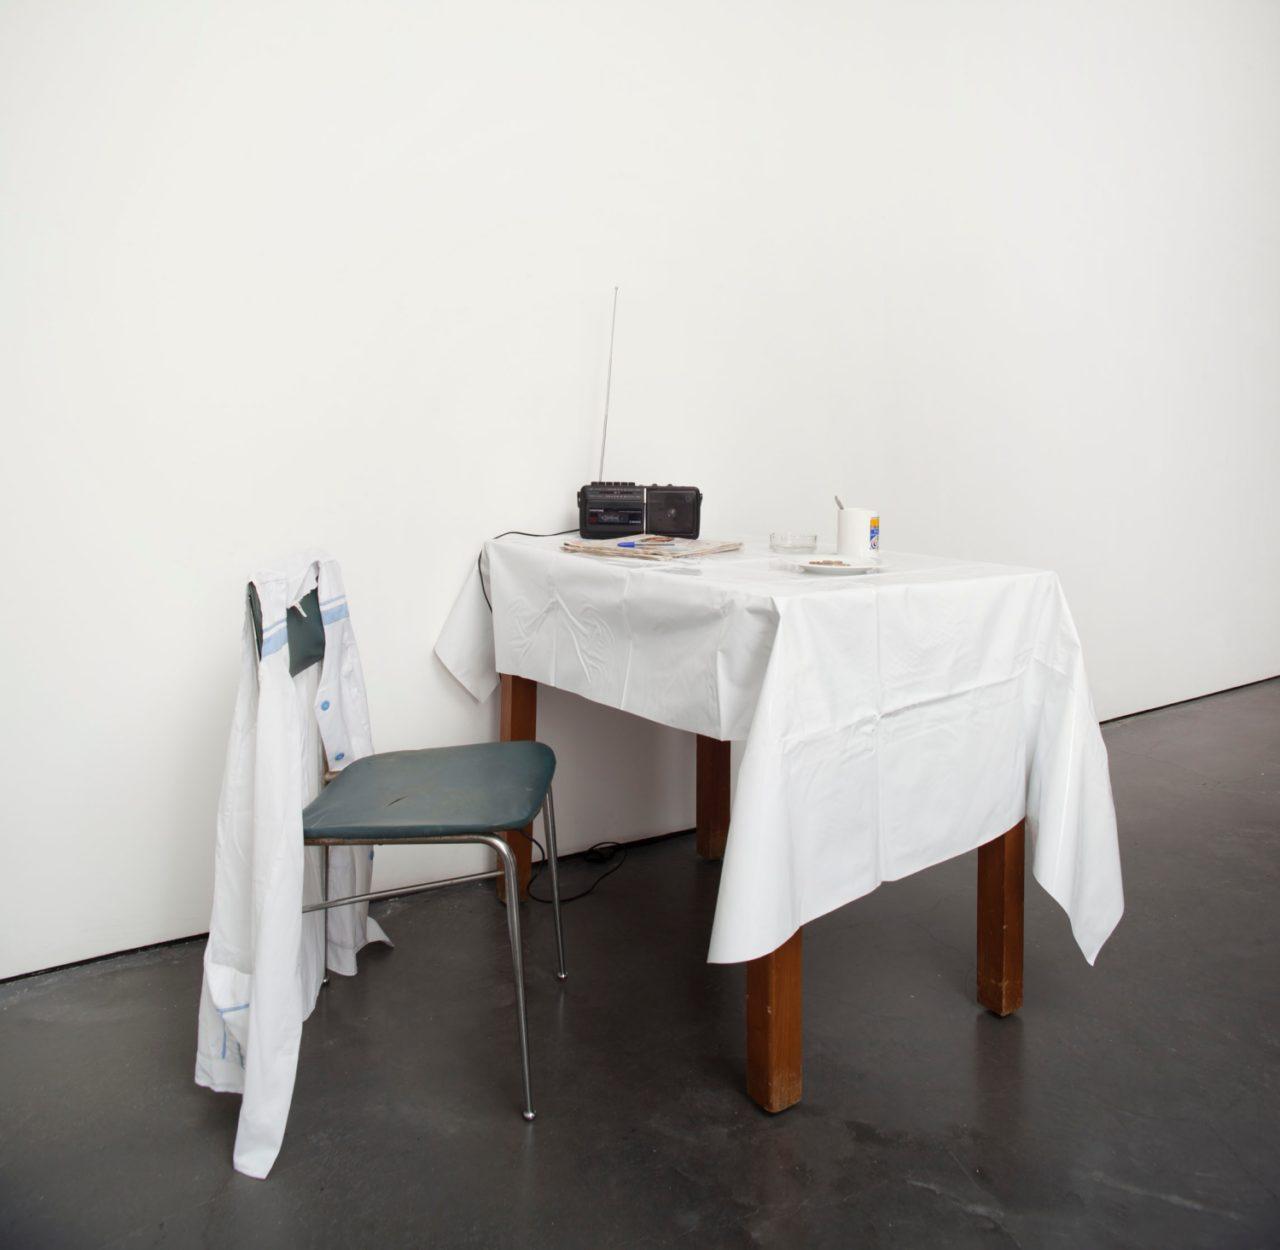 Christoph Büchel, untitled (Düsseldorf) (2001/2006)